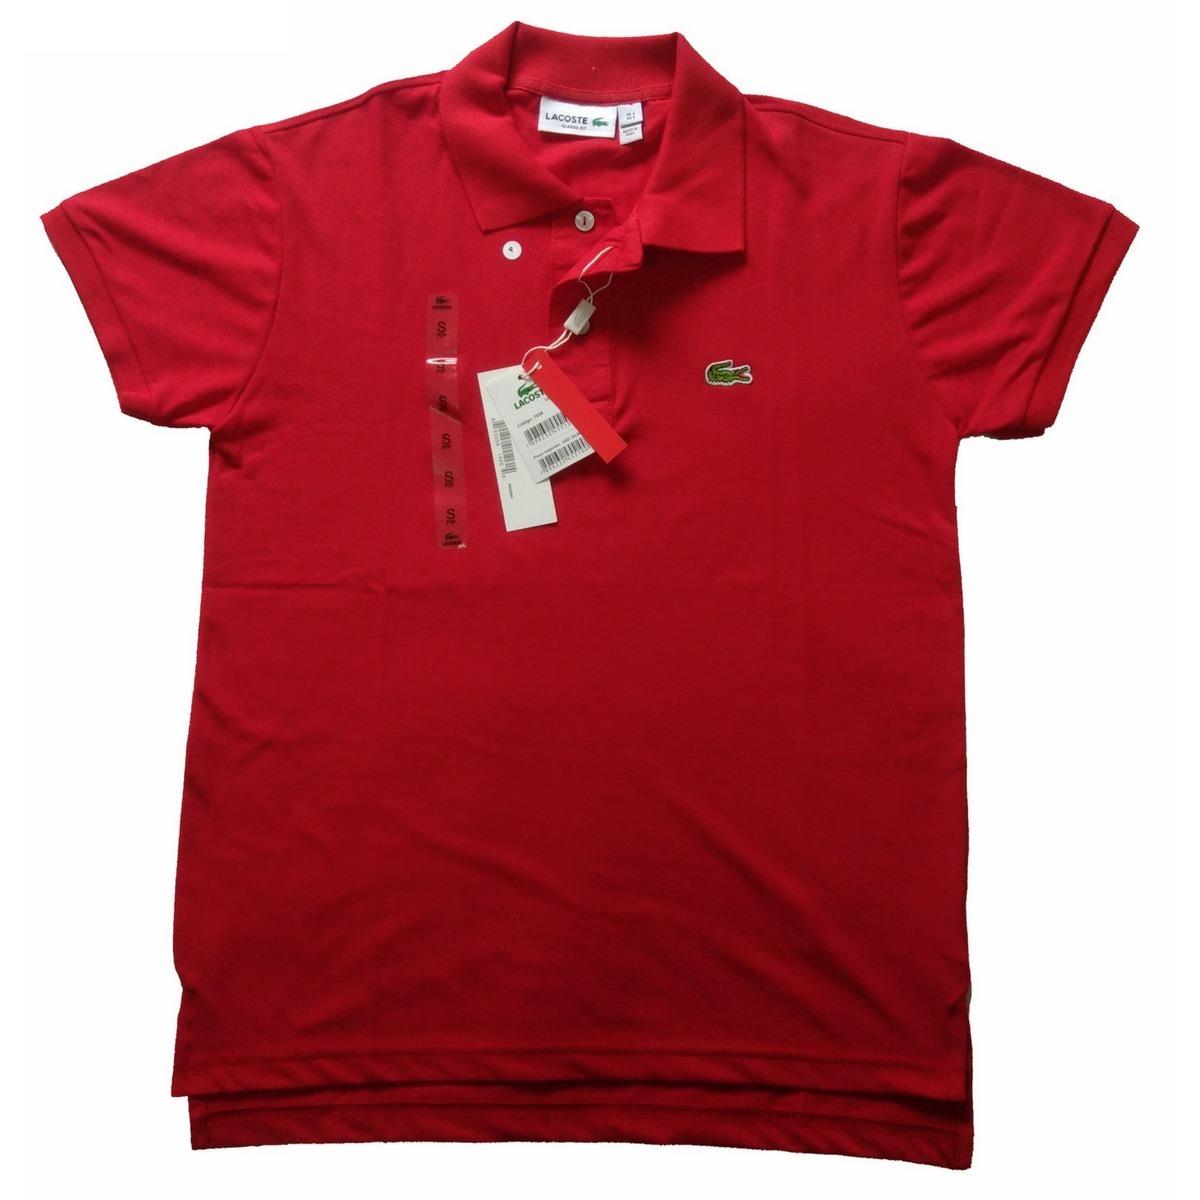 camisa polo lacoste masculina peruana - promoção. Carregando zoom. 350f66f79f270